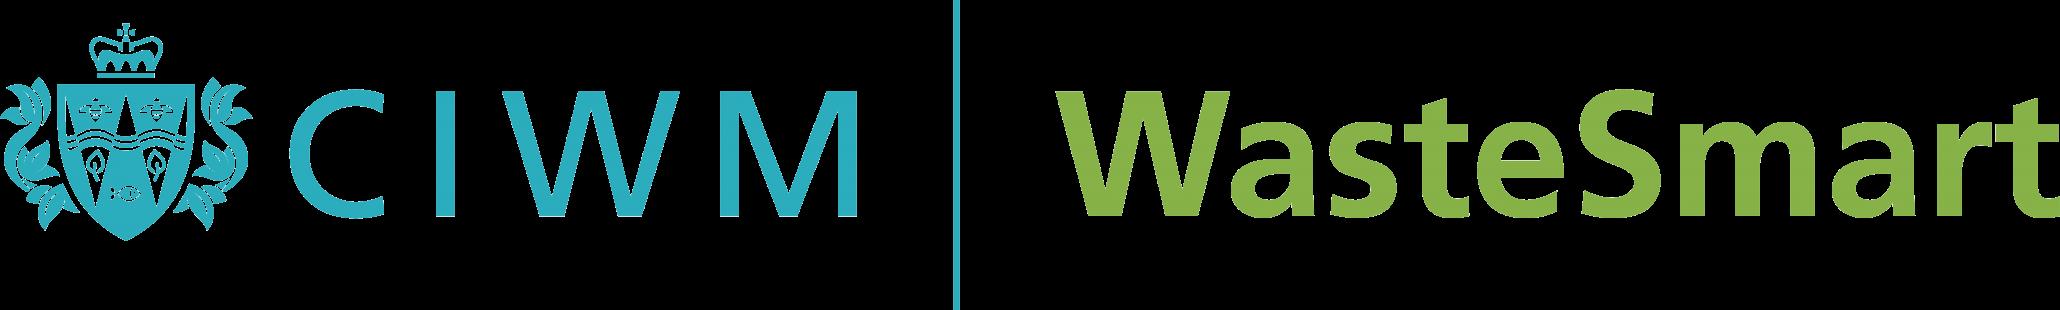 WasteSmart-Large